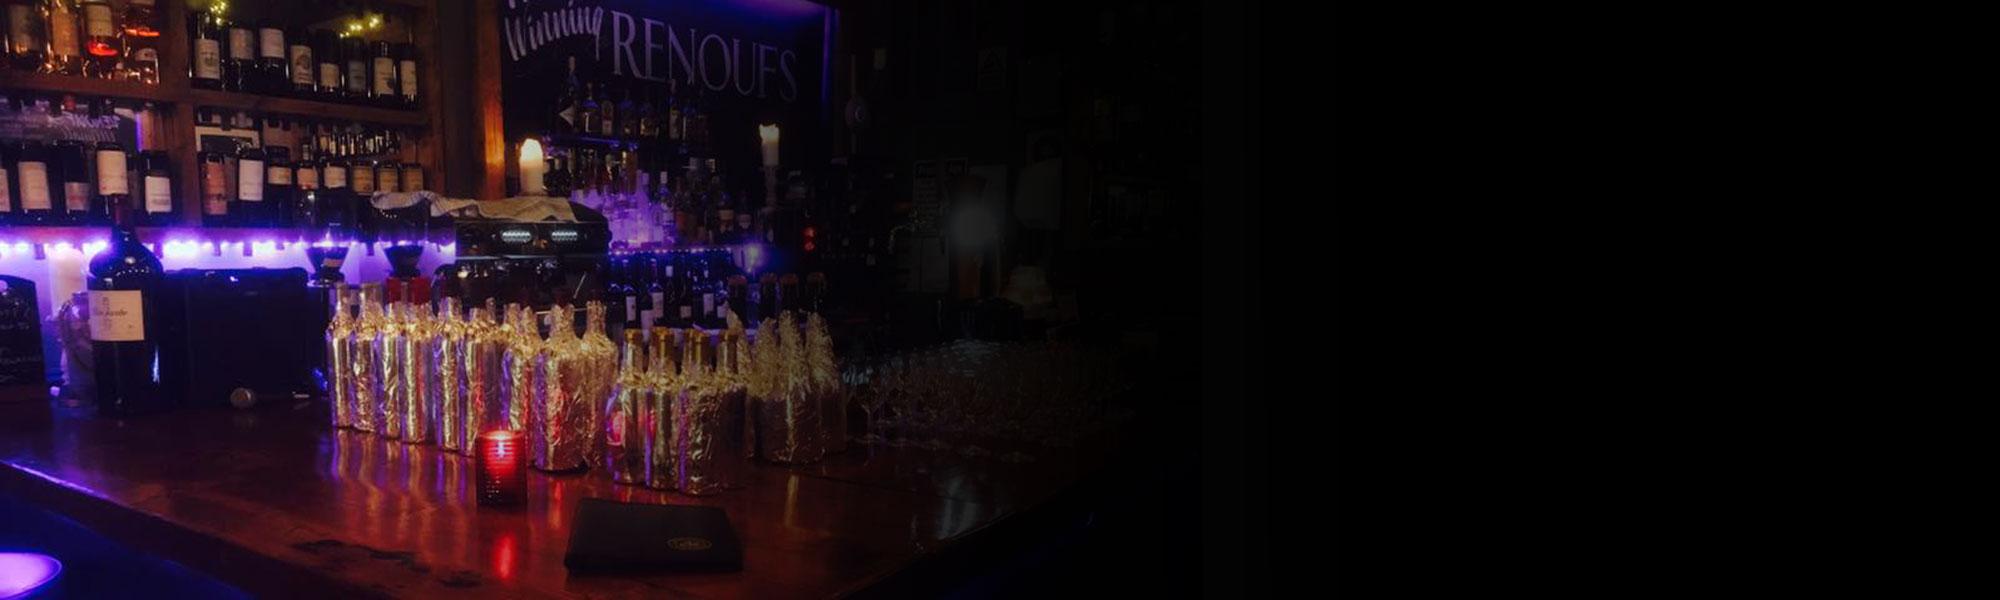 Bar at Renoufs